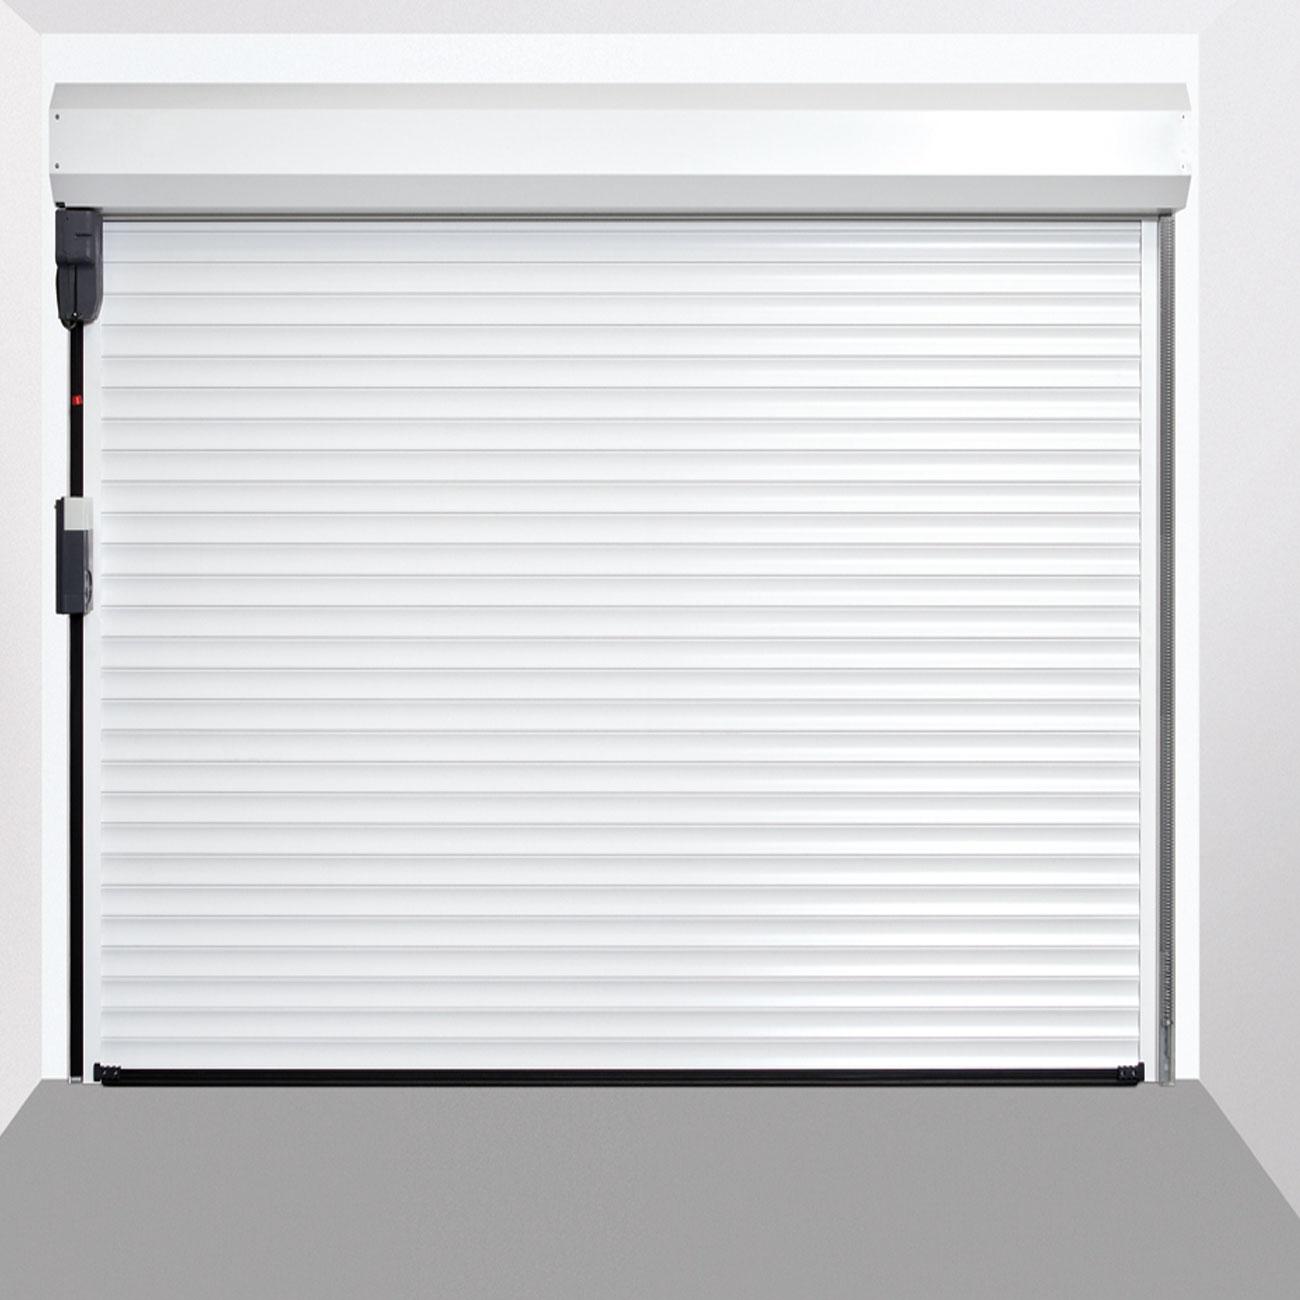 Hormann Rollmatic Emsworth Garage Doors